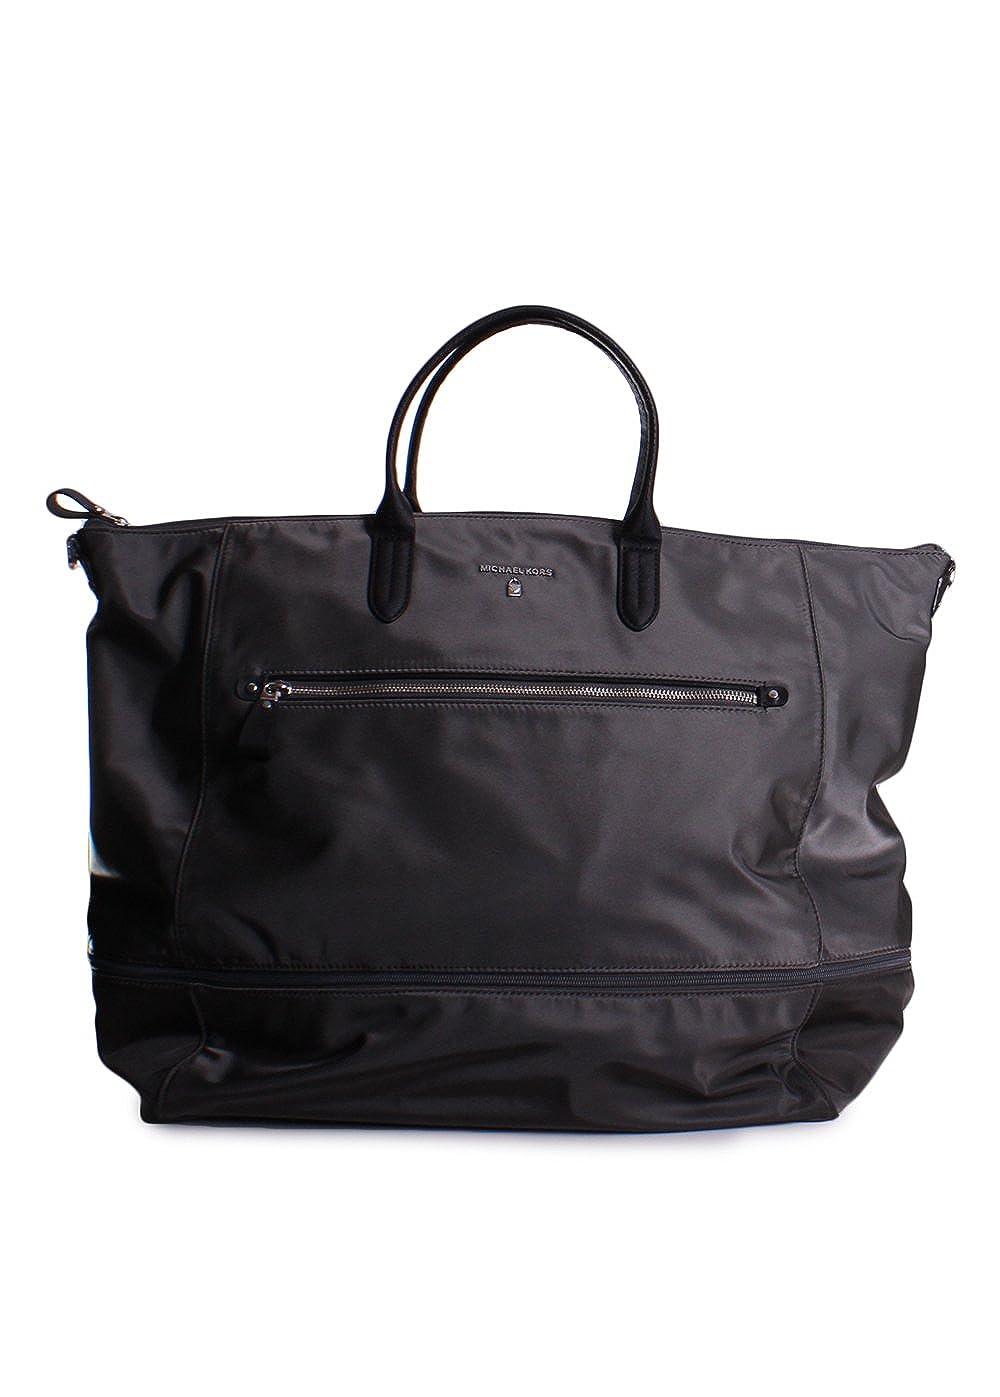 6ca5bde5bb5956 Amazon.com: Michael Kors Kelsey Nylon Expandable Extra Large Travel Tote in  Graphite: Clothing